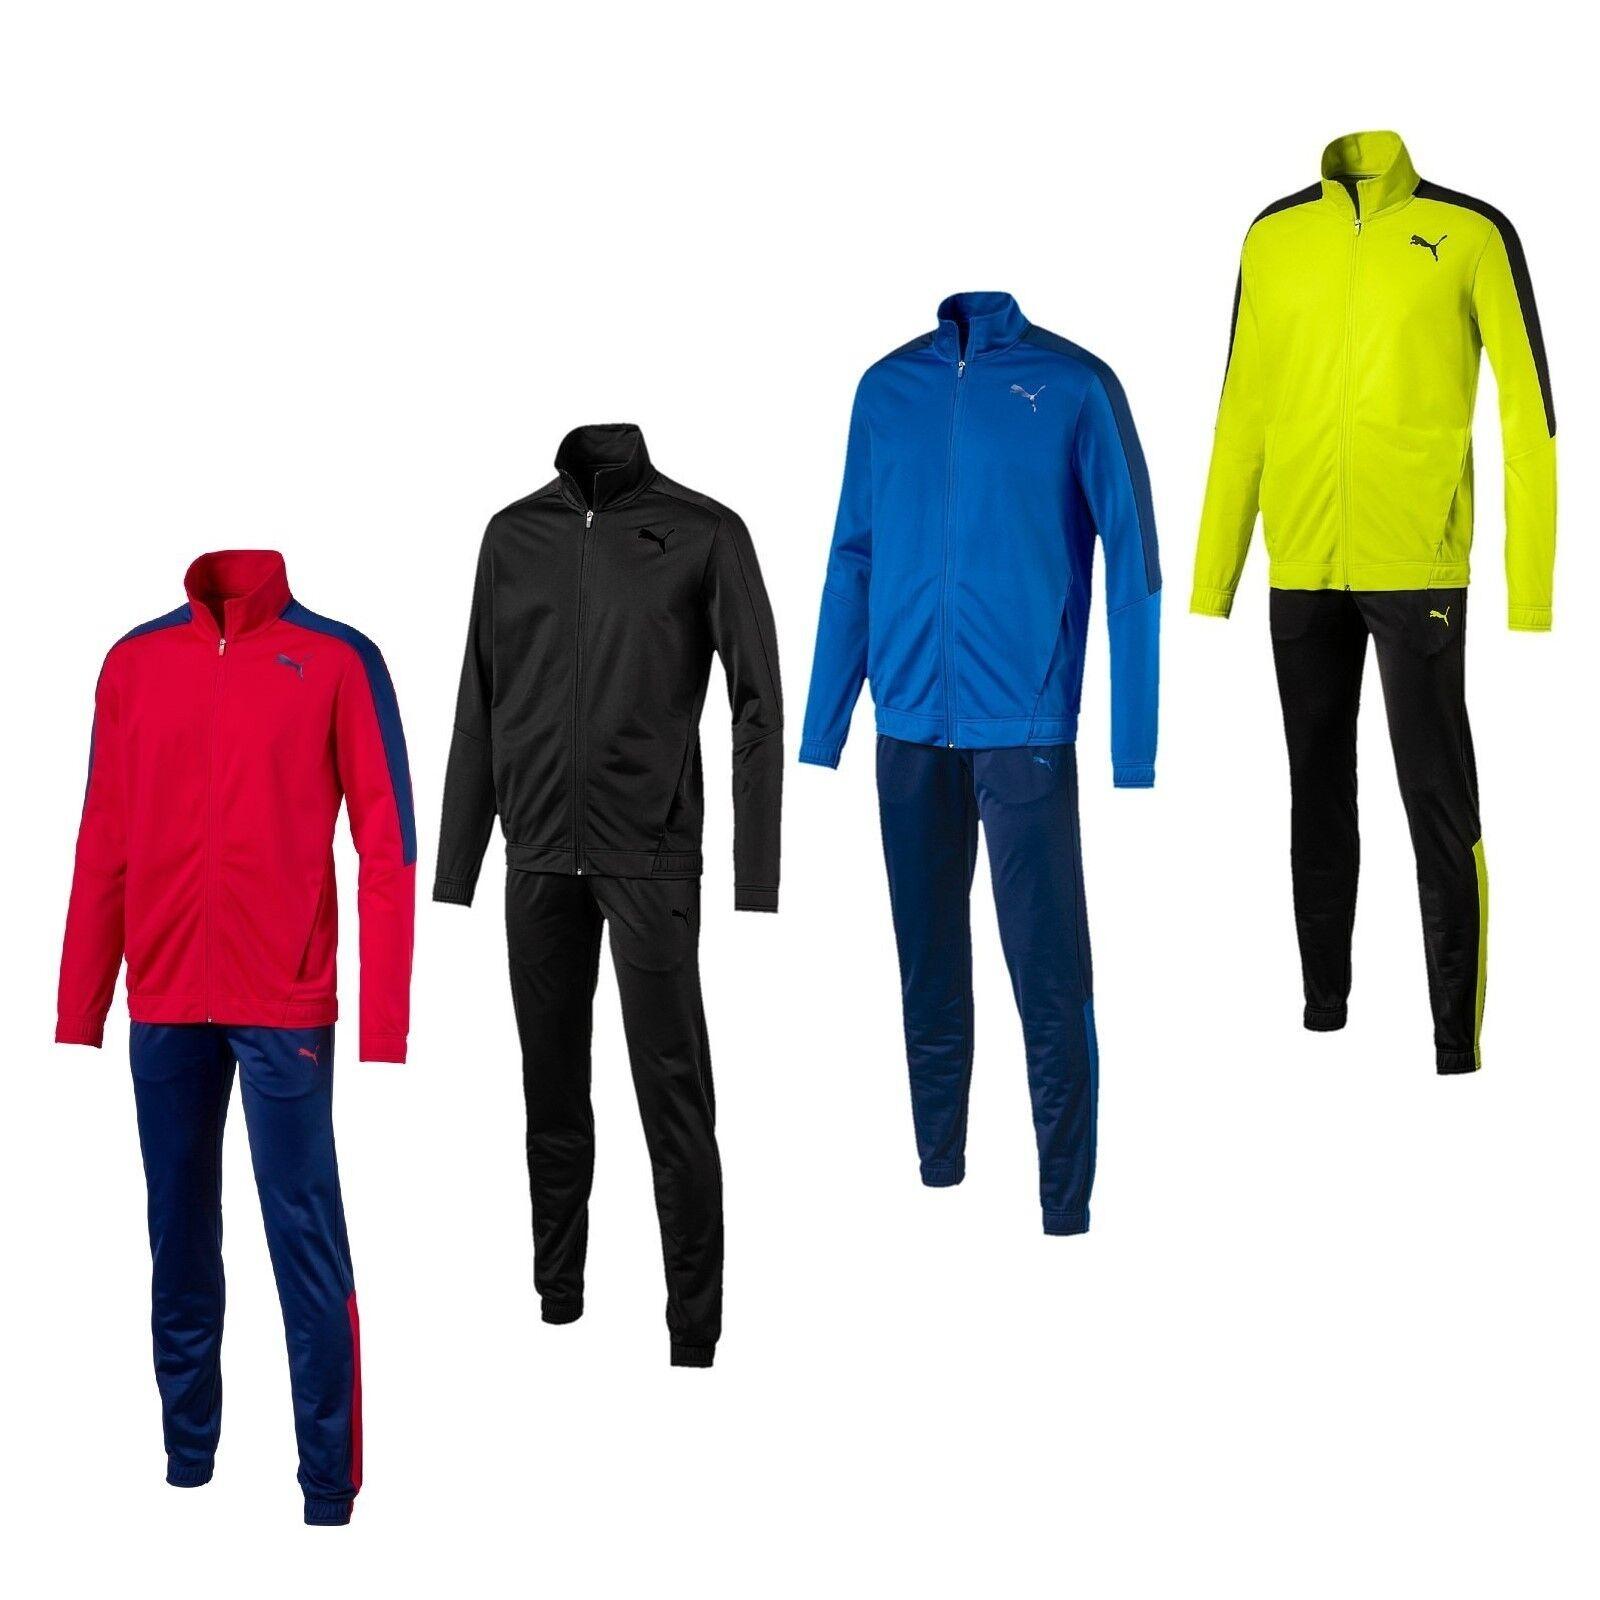 Puma Herren Sportanzug Jogginganzug Trainingsanzug rot schwarz blau Männer